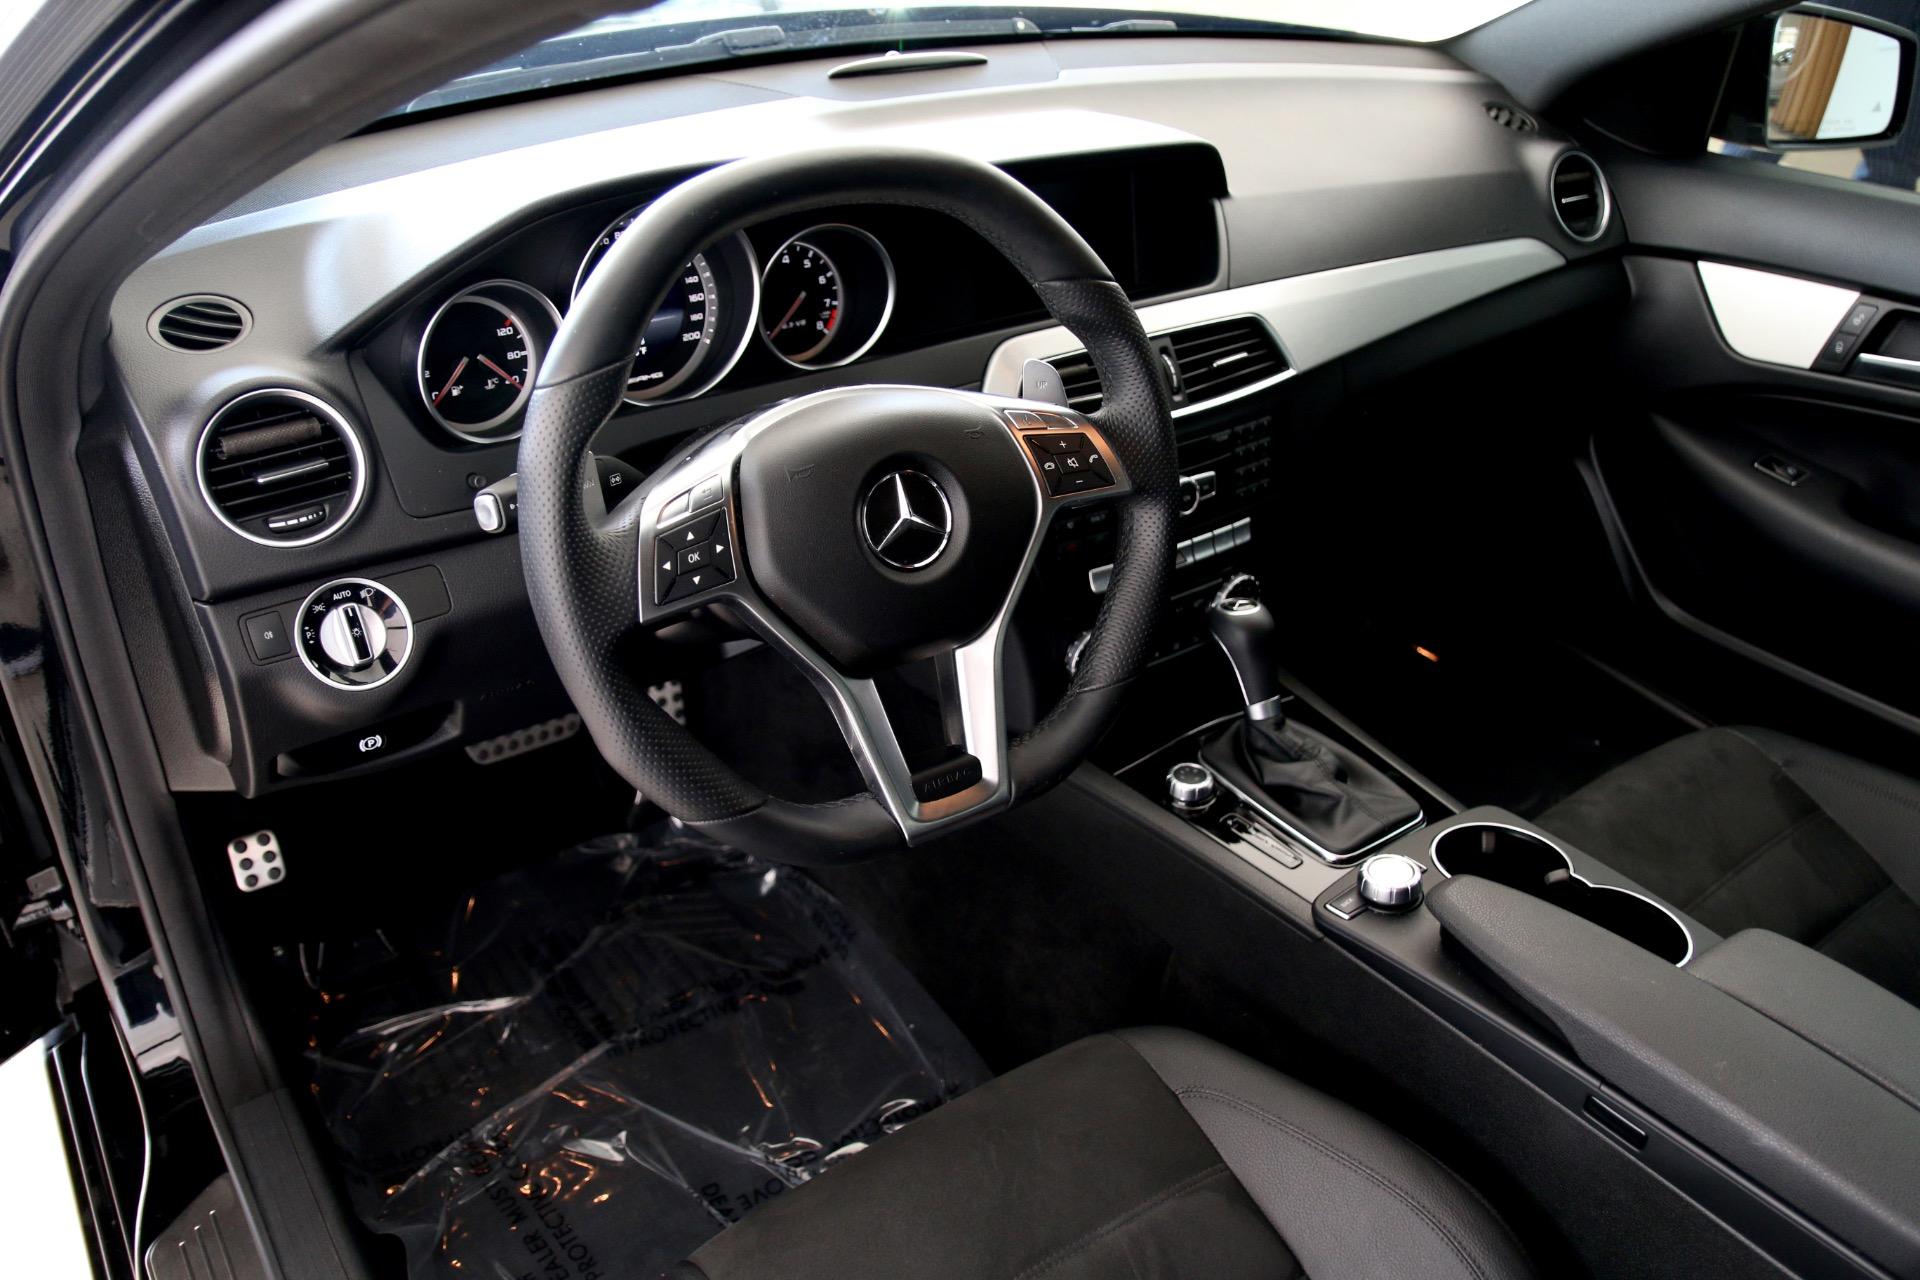 Buy Used Tires Near Me >> 2014 Mercedes-Benz C-Class C 63 AMG Stock # P023904A for sale near Vienna, VA | VA Mercedes-Benz ...